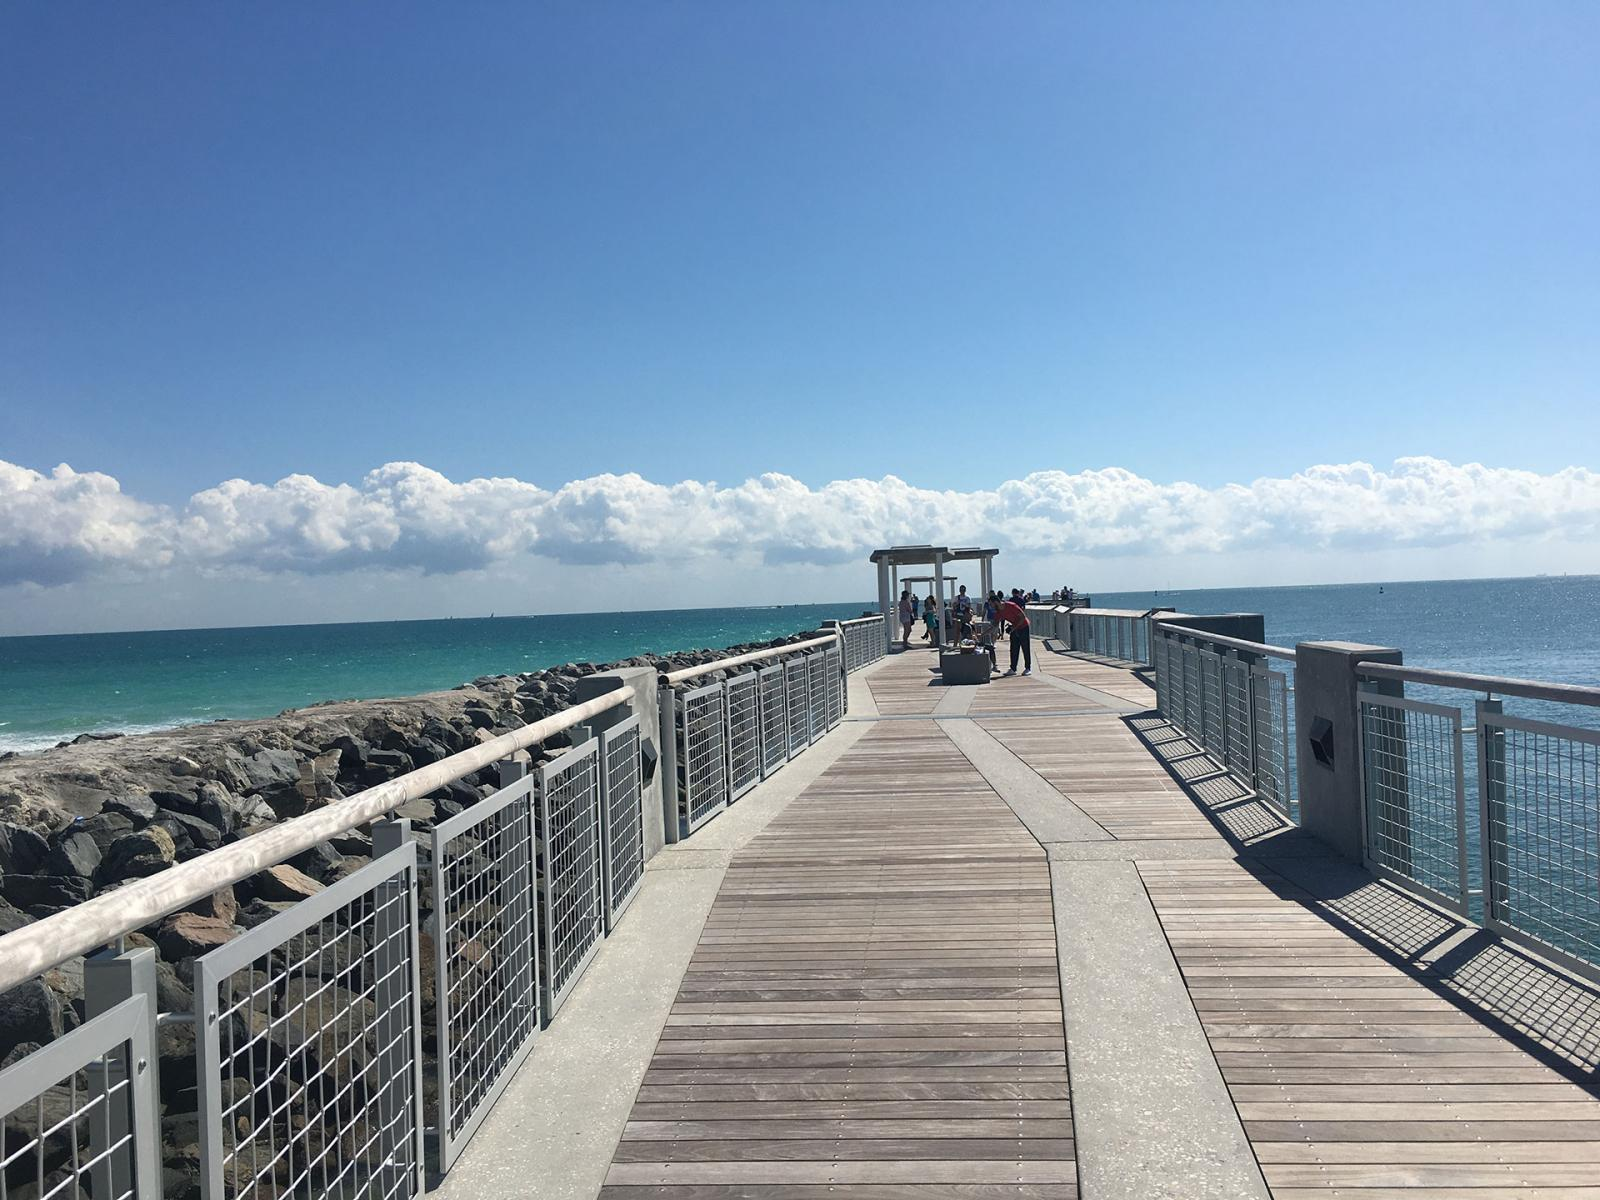 Miami Beach lugares de interes: South Pointe Park